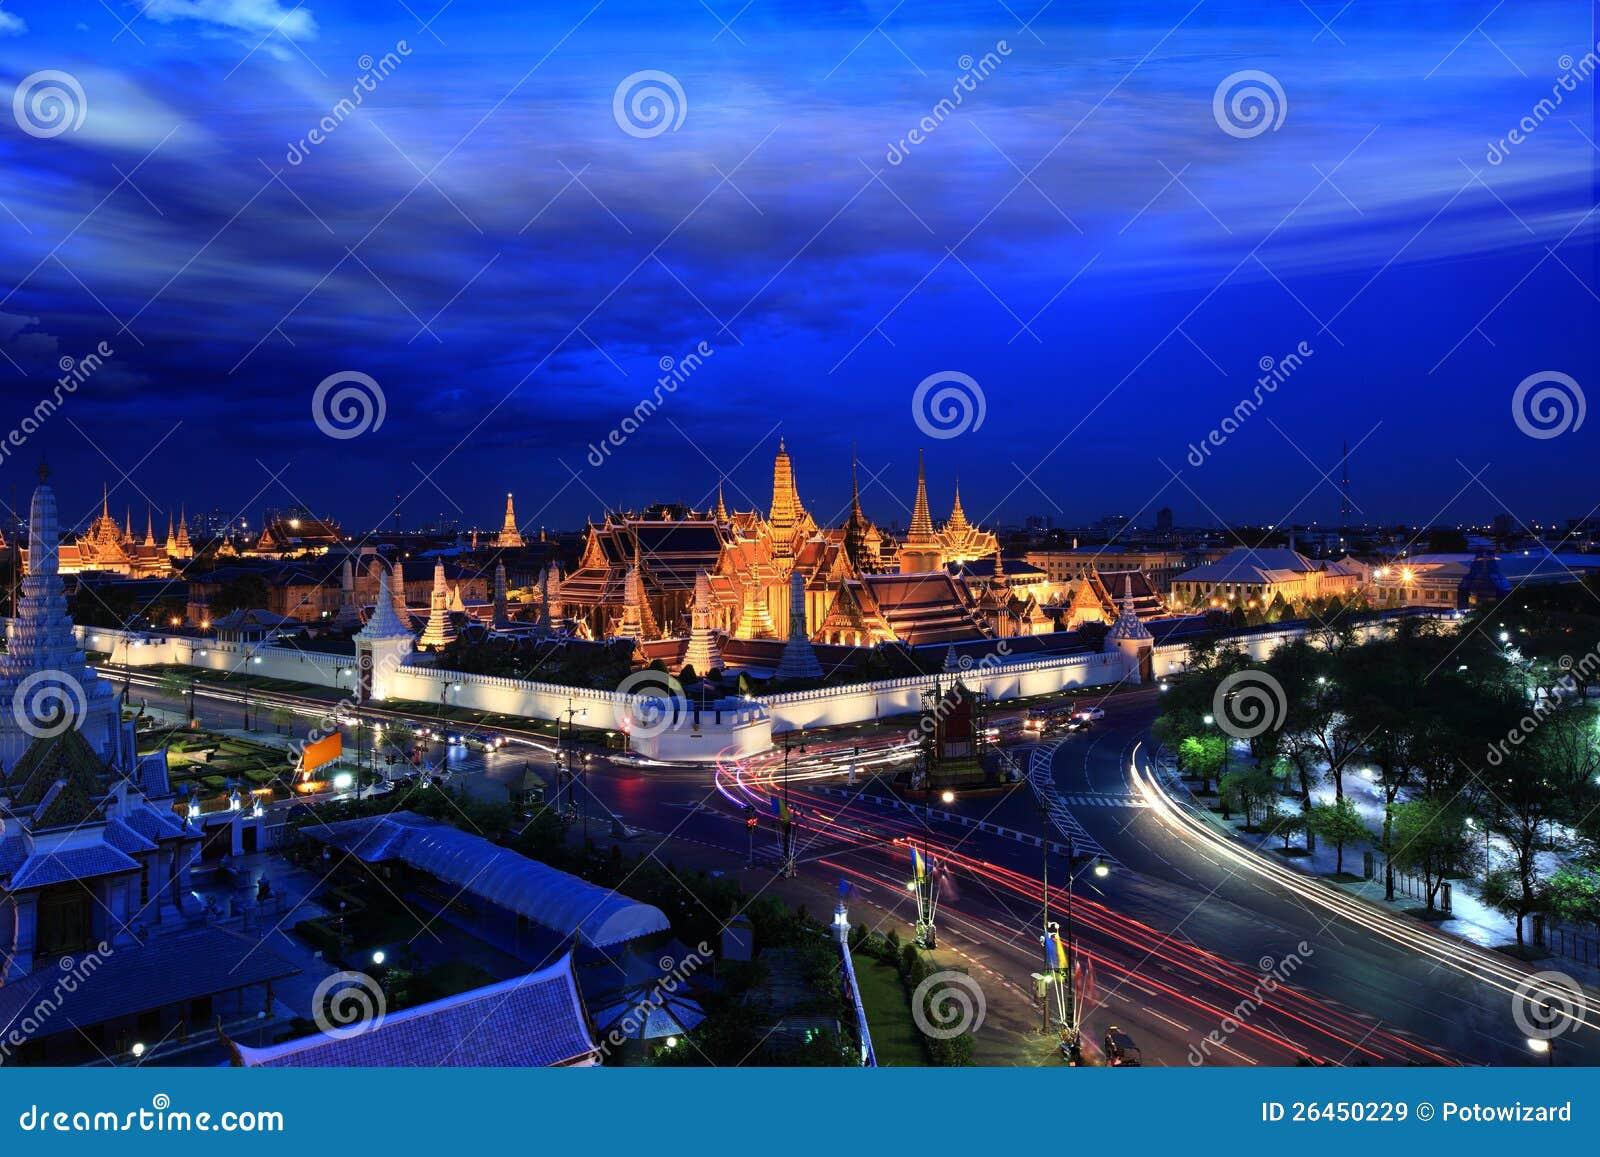 Wat Phra Kaew Royalty Free Stock Images - Image: 26450229